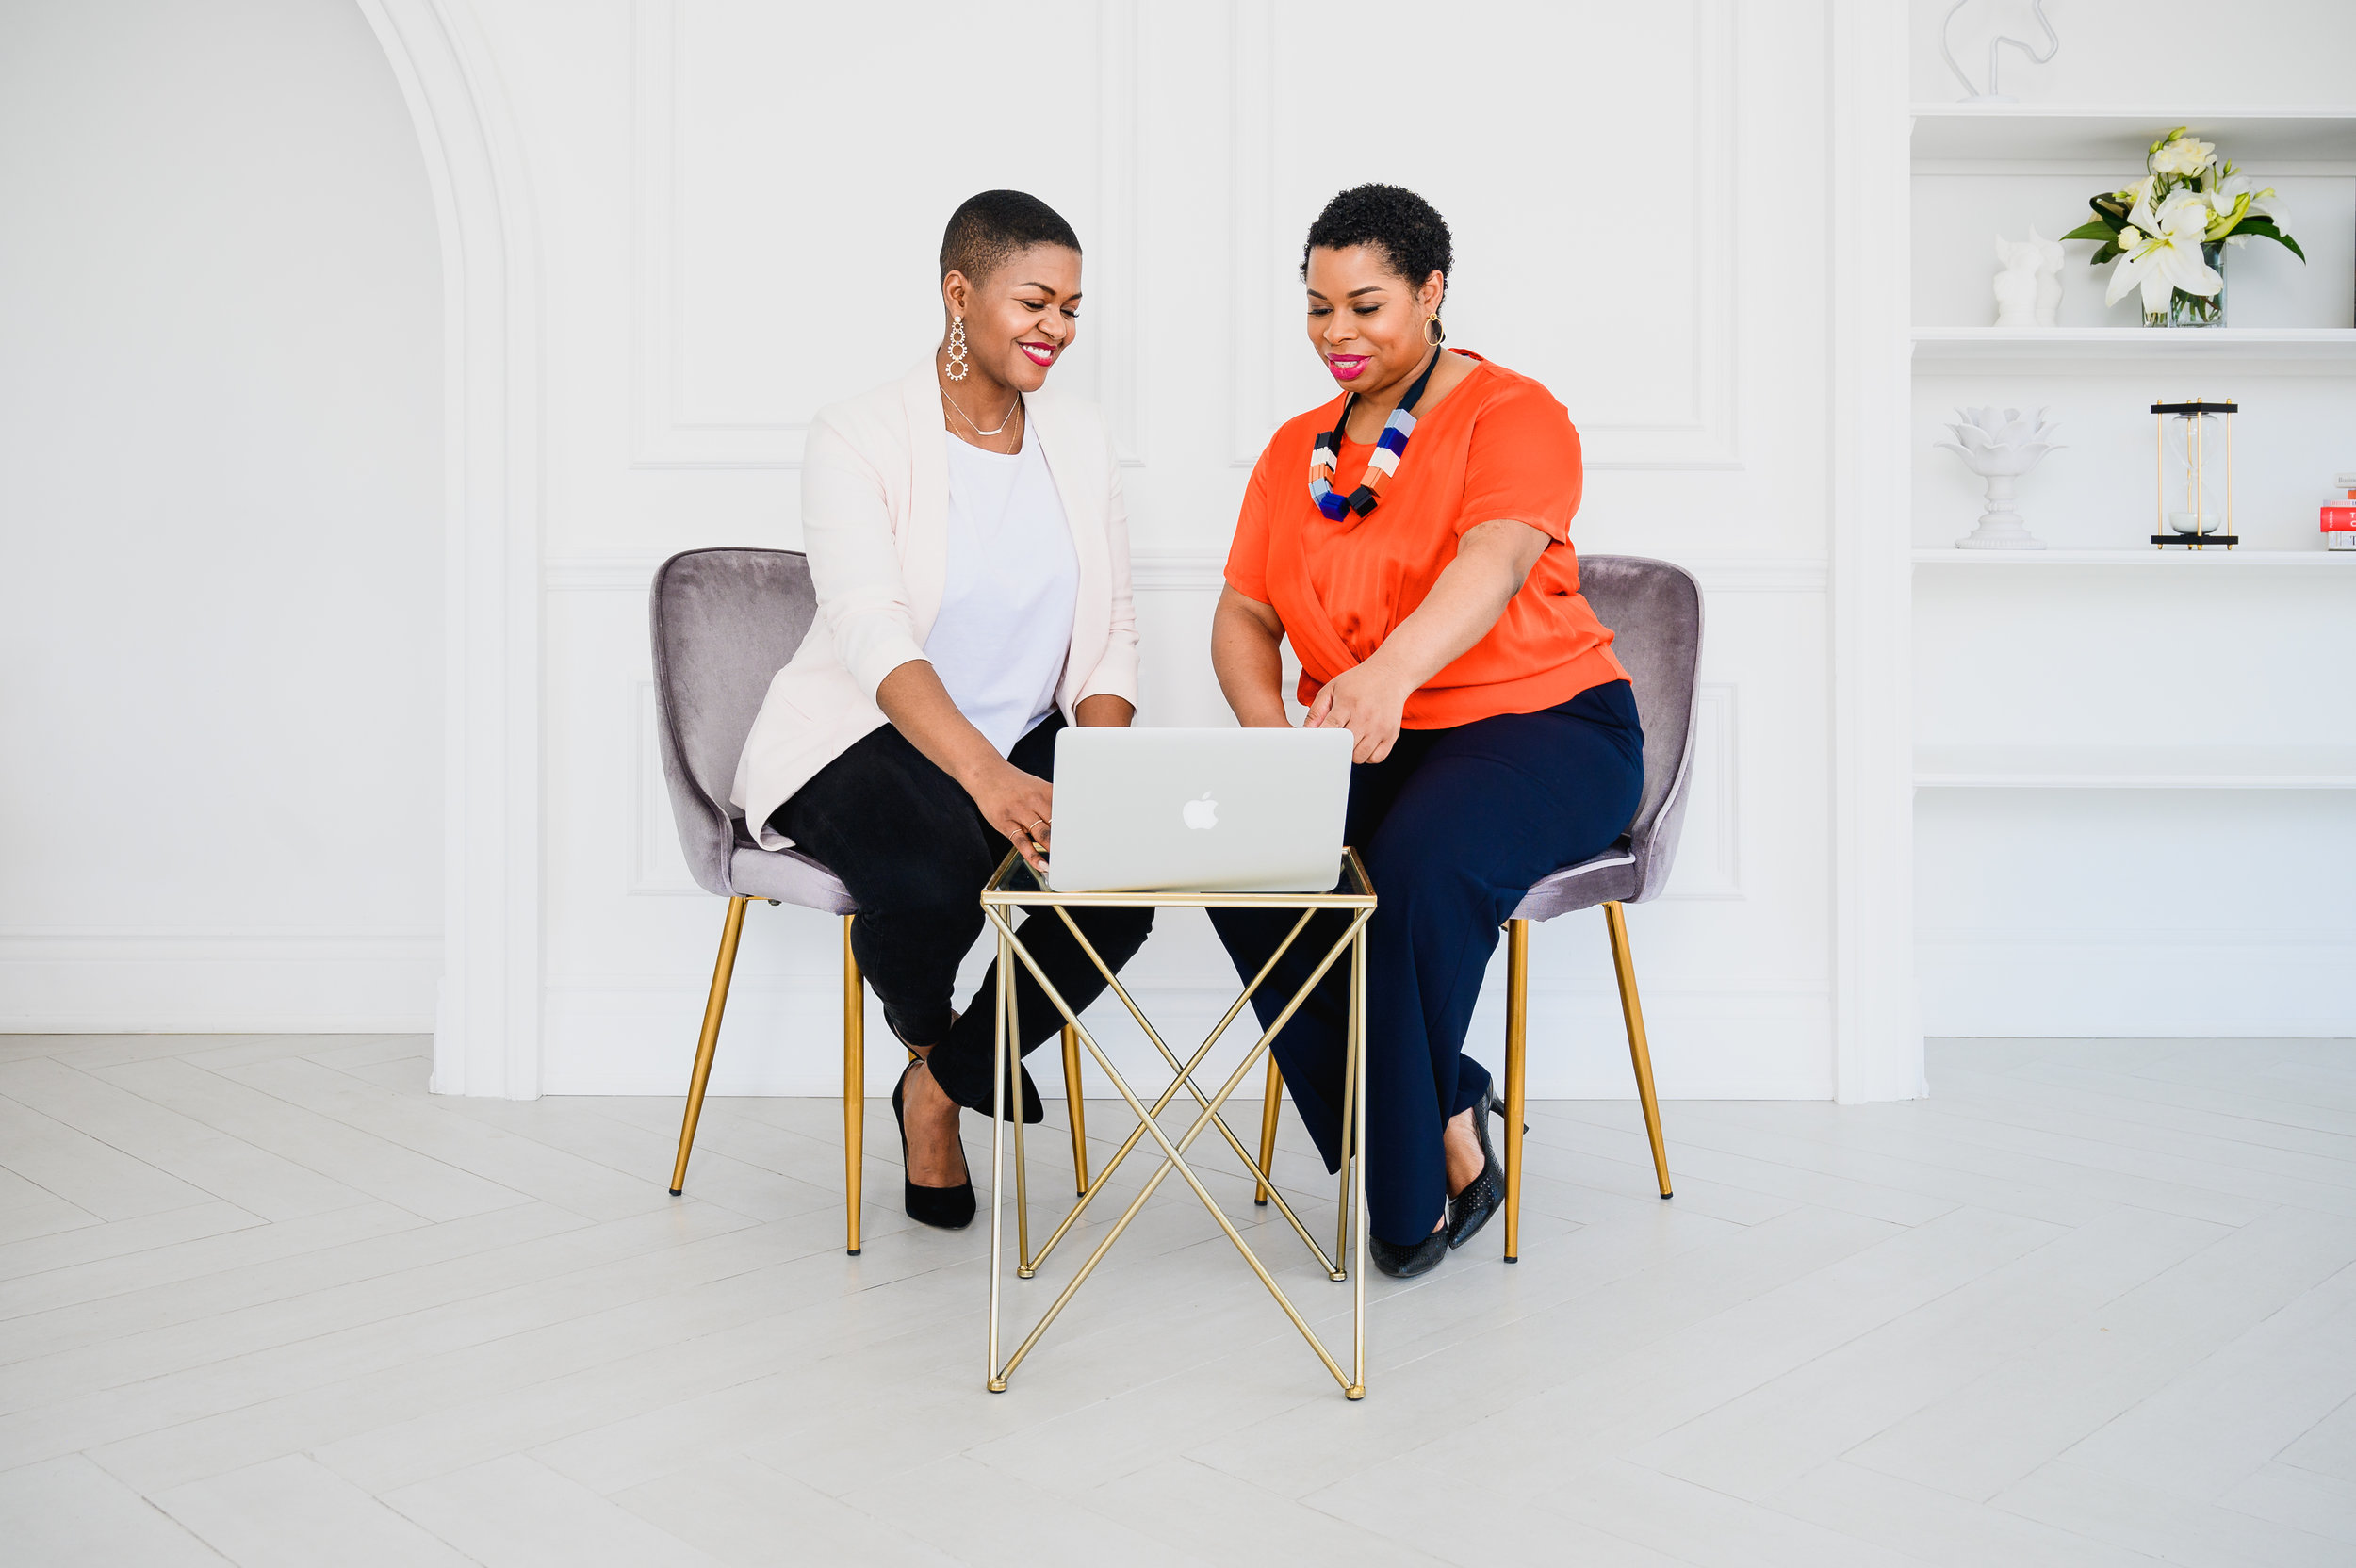 Andrea Henry Business LAW - PRINT - 2019 - Branding Photography - Mike Black PhotoWorks dot com-13.jpg